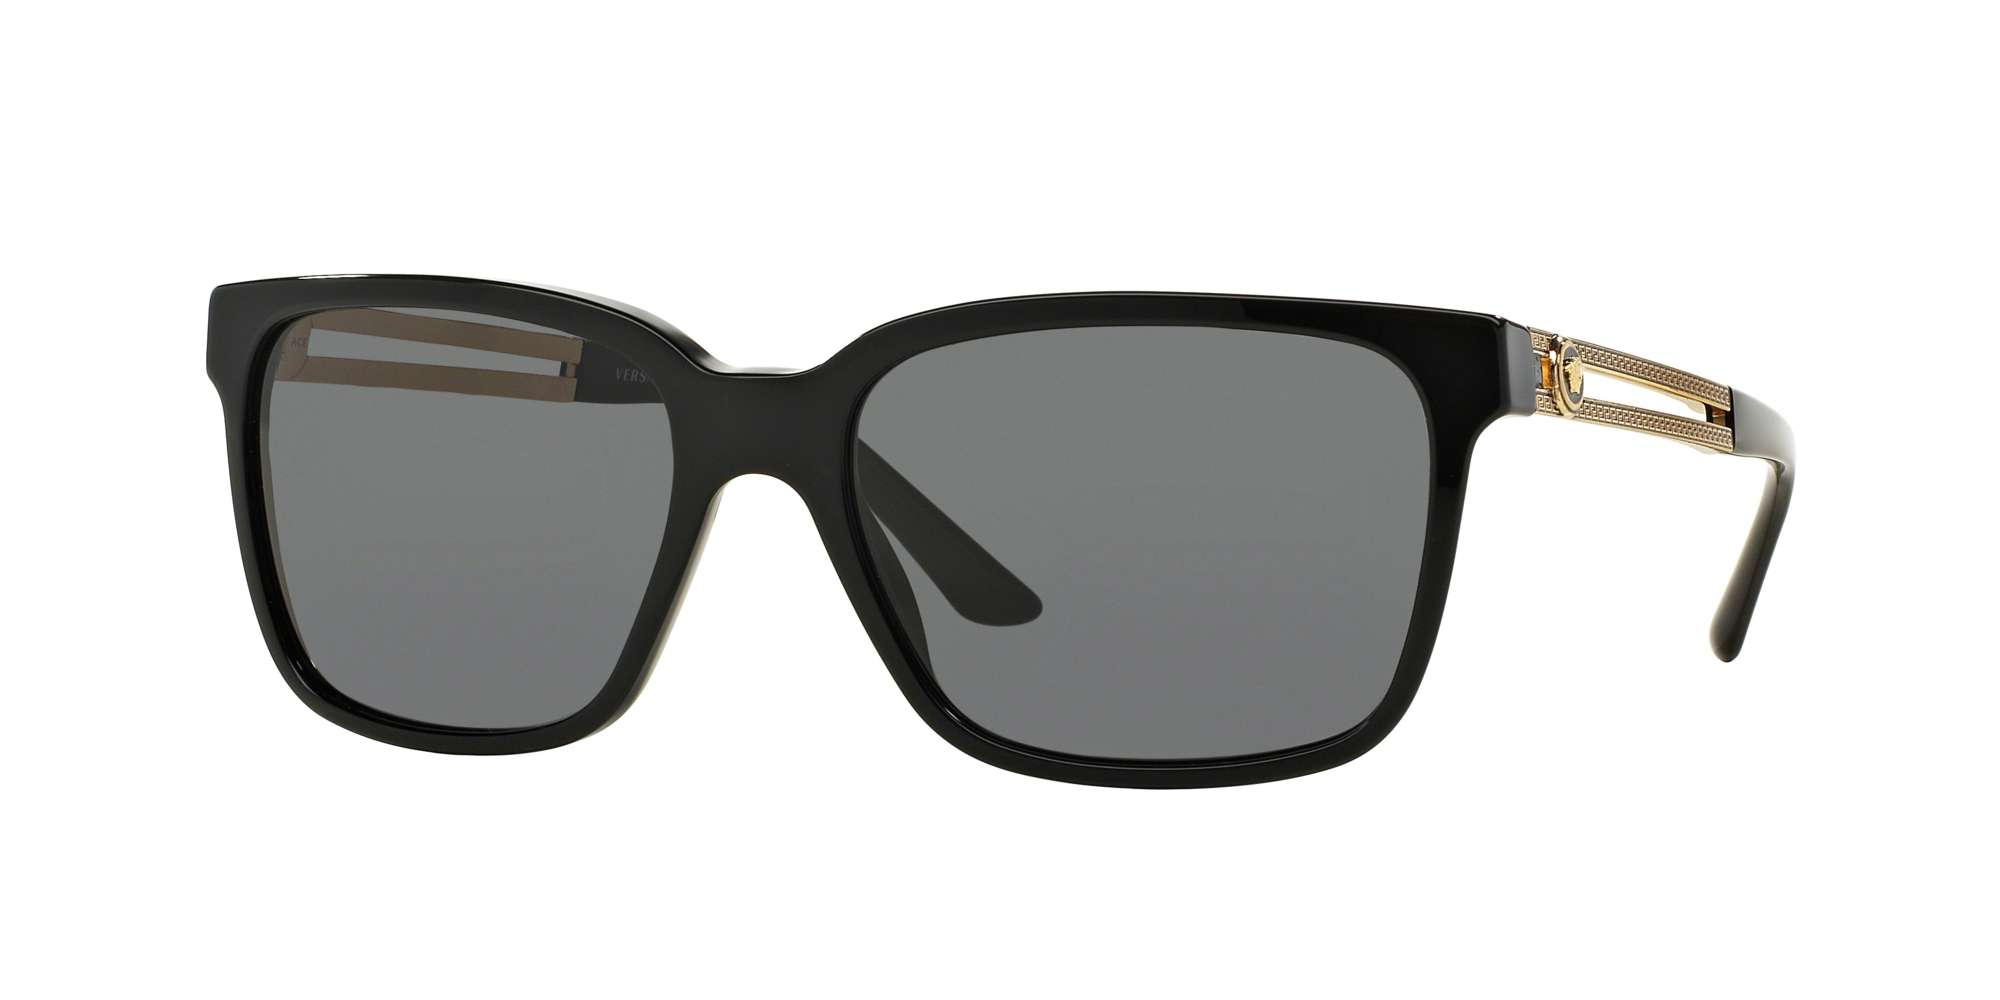 BLACK / GREY lenses